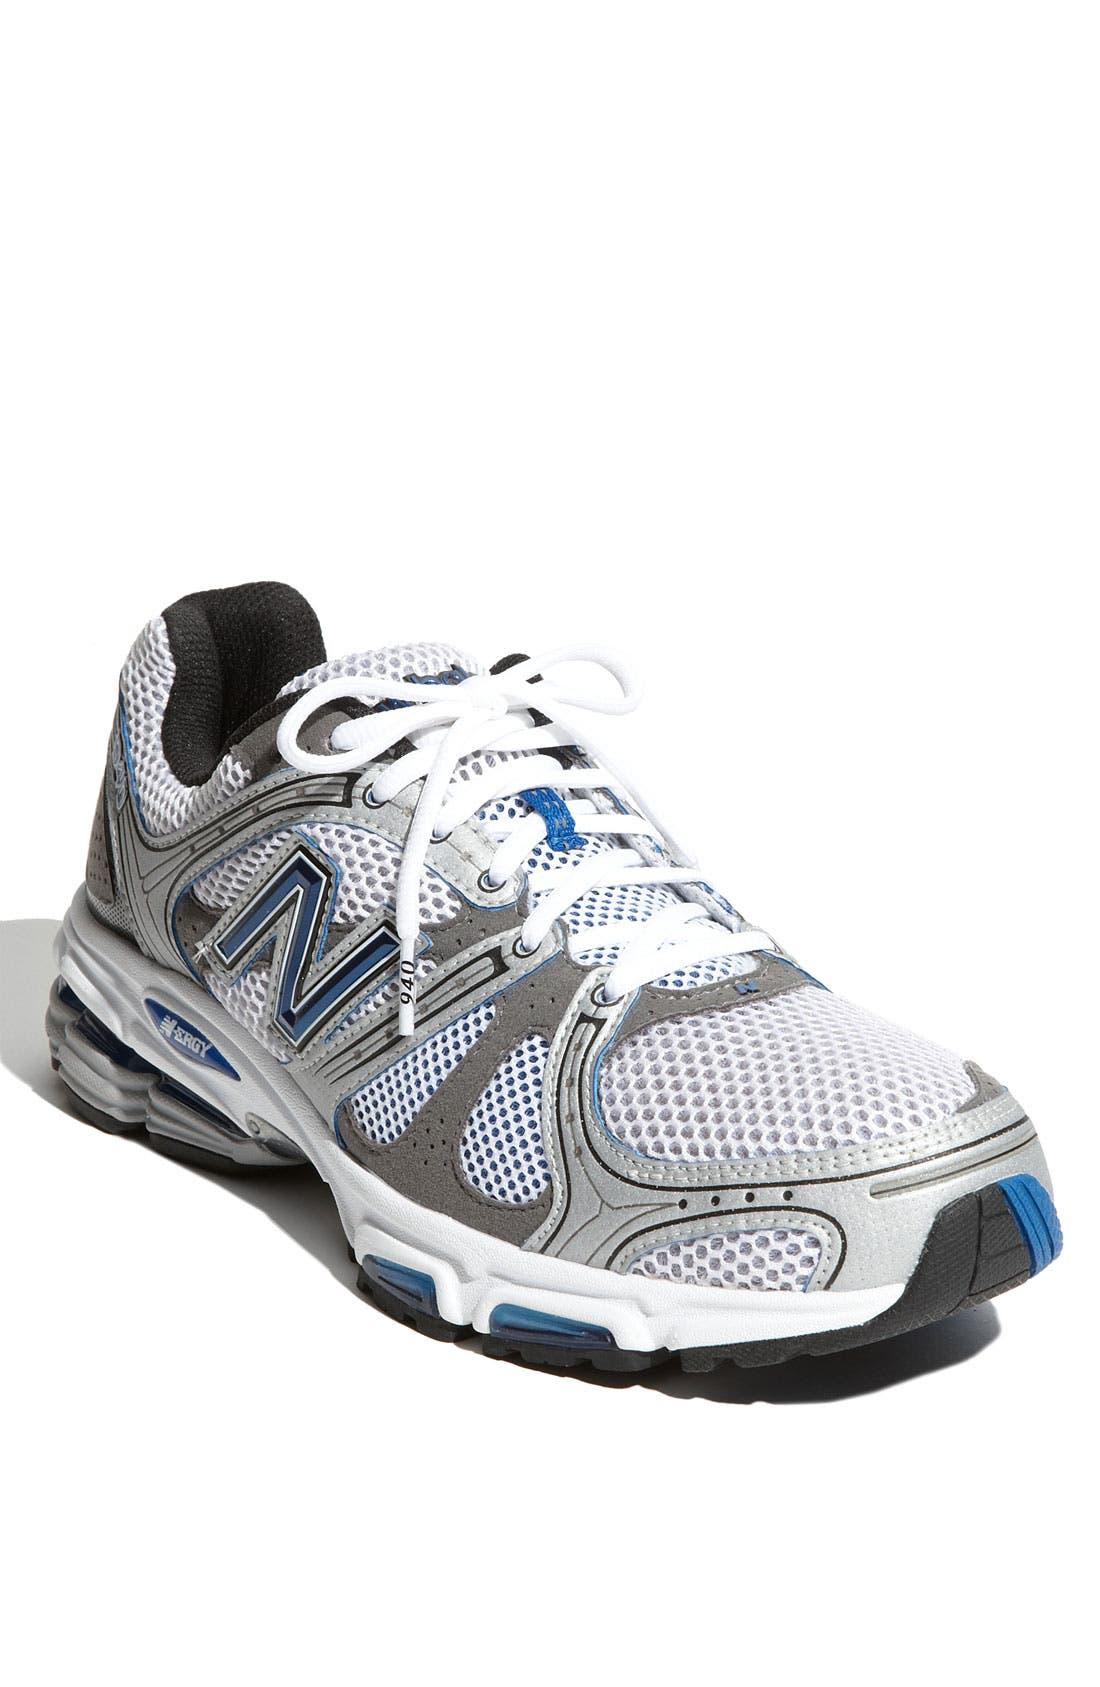 Main Image - New Balance '940' Running Shoe (Men) (Online Only)